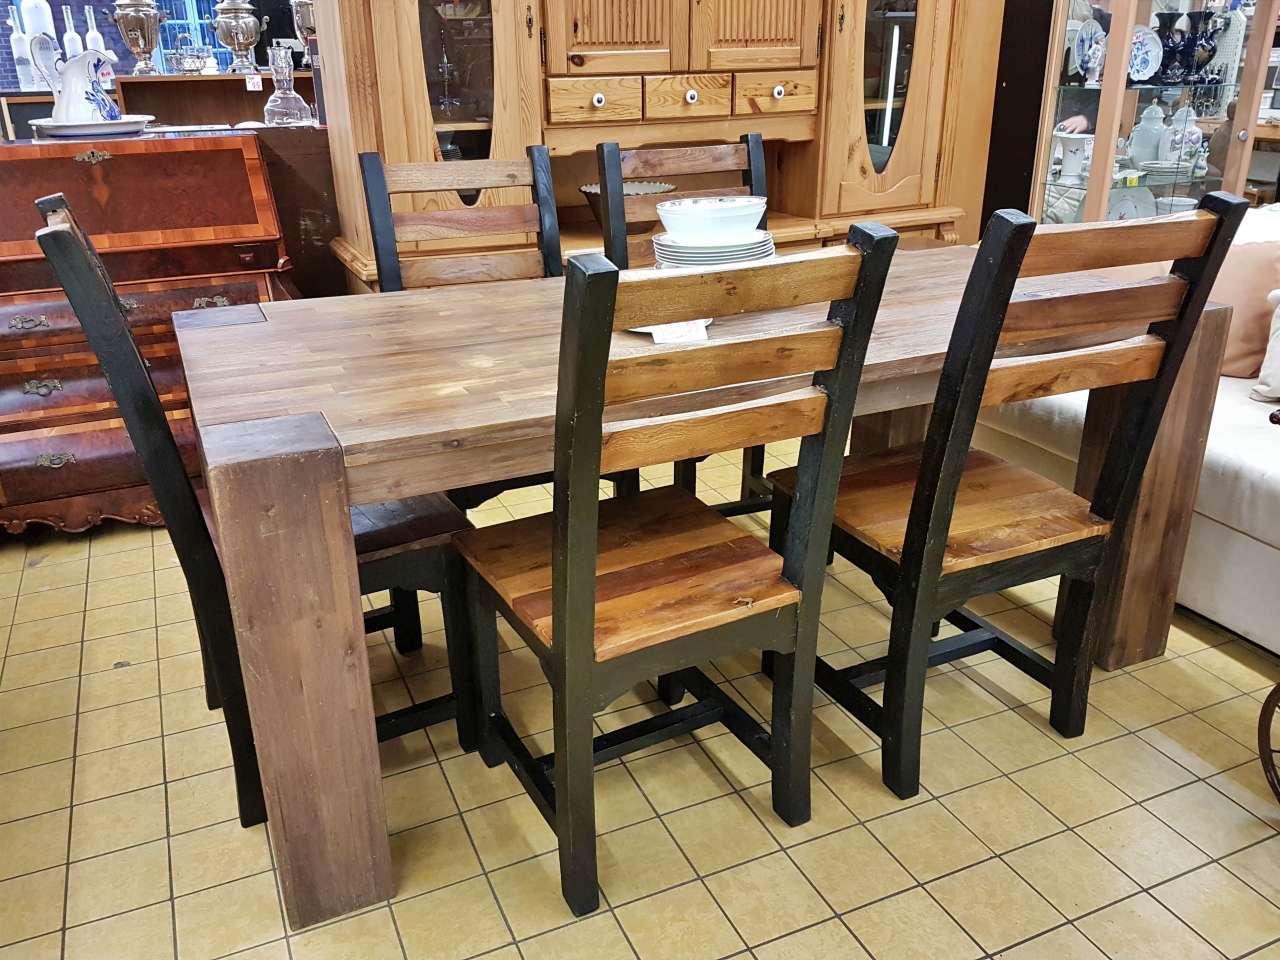 Möbel Essgruppe mit 5 Stühlen Holz rustikal